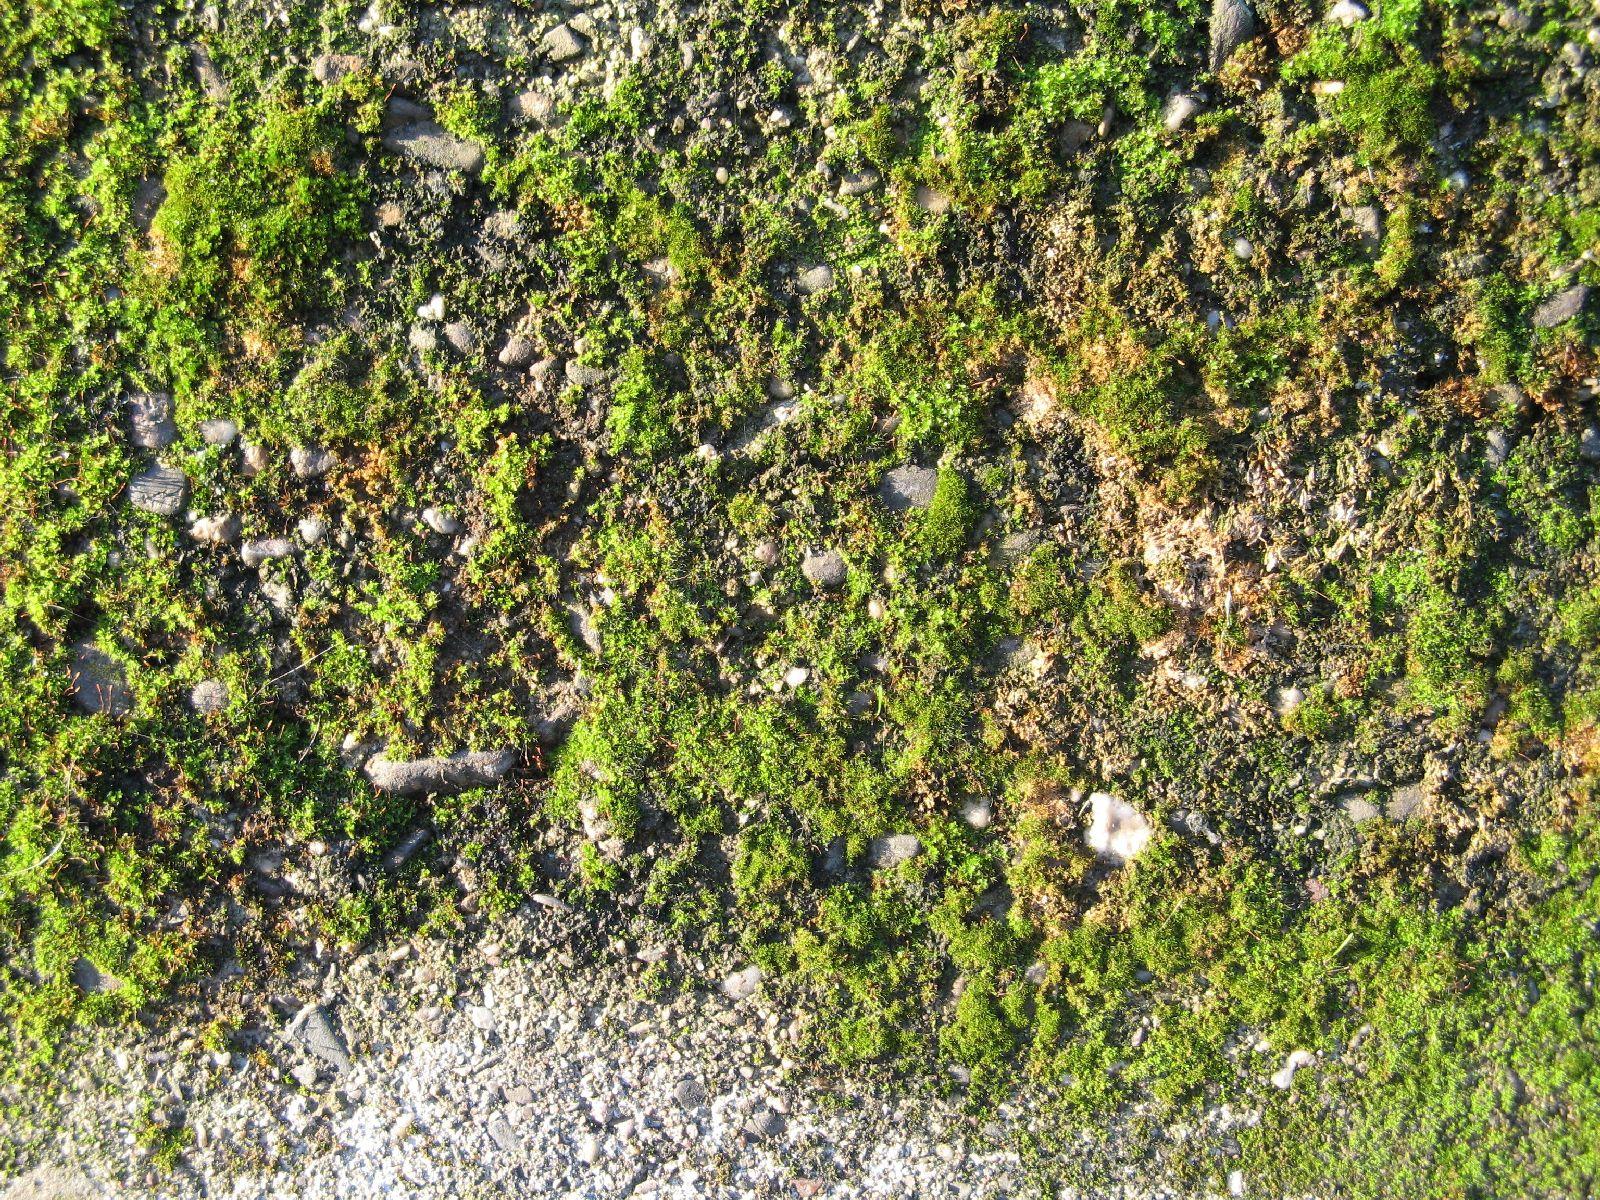 Boden-Gras-Moos-Blumen_Textur_B_10580